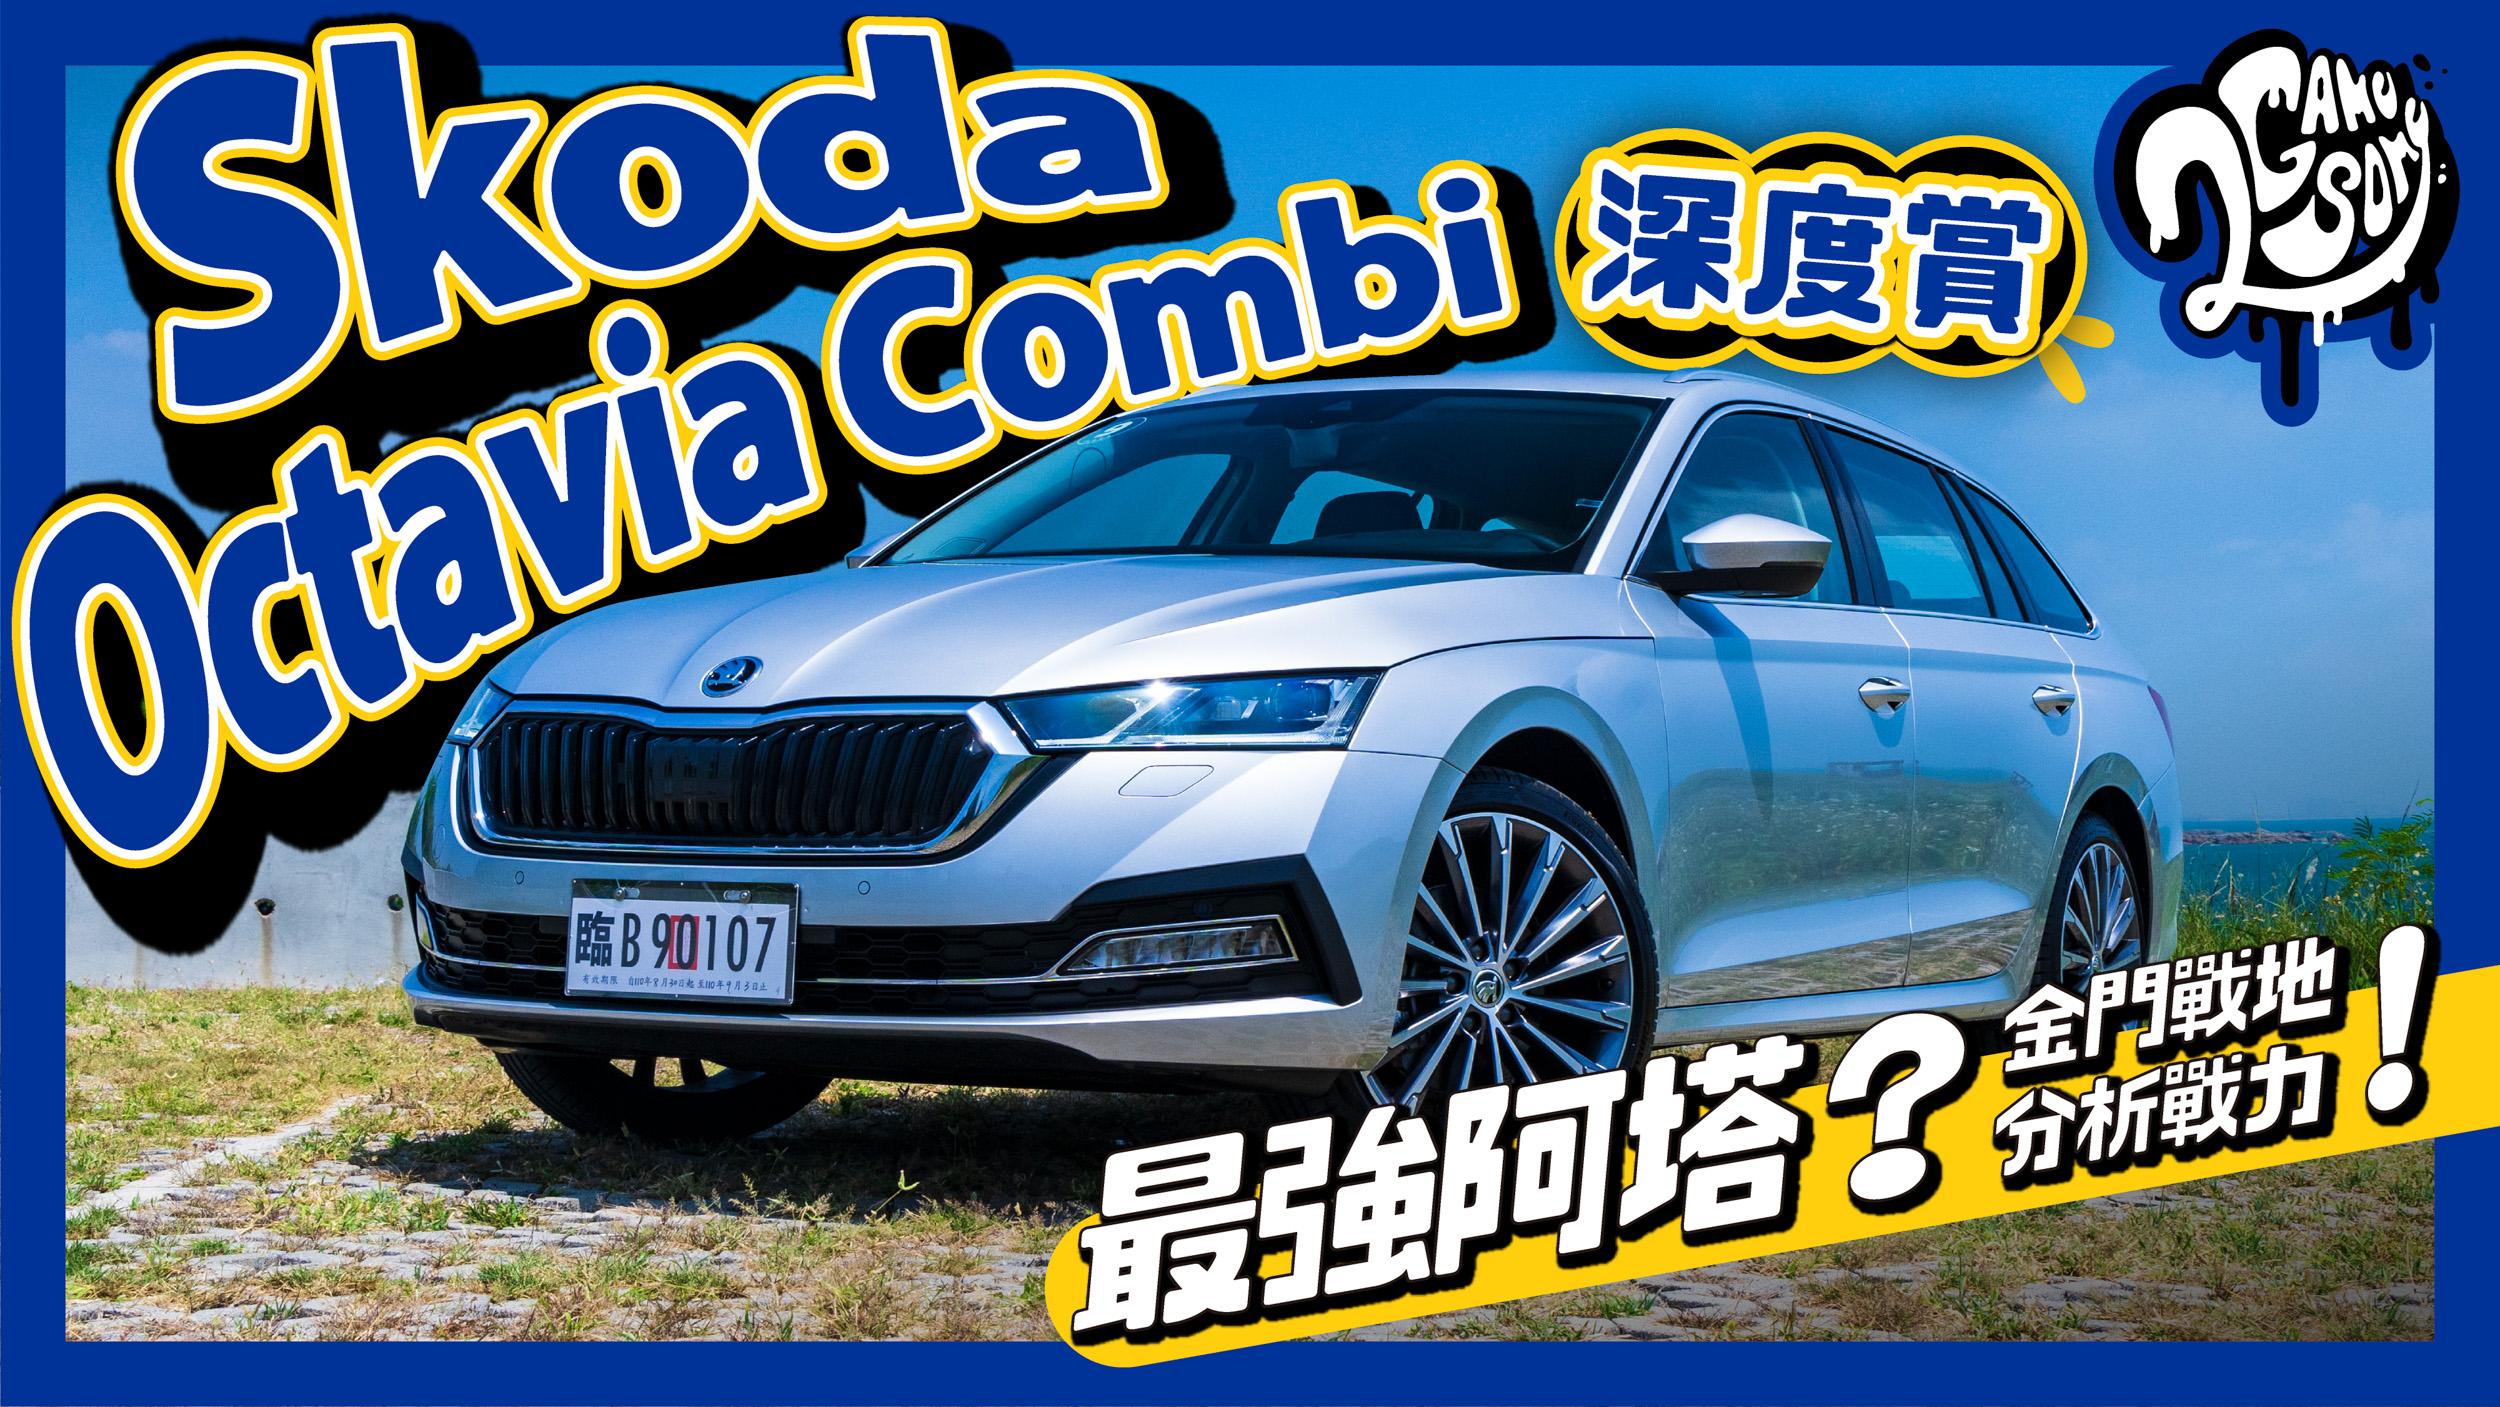 ▲ Skoda Octavia Combi 深度賞|最強阿塔?金門戰地分析戰力!